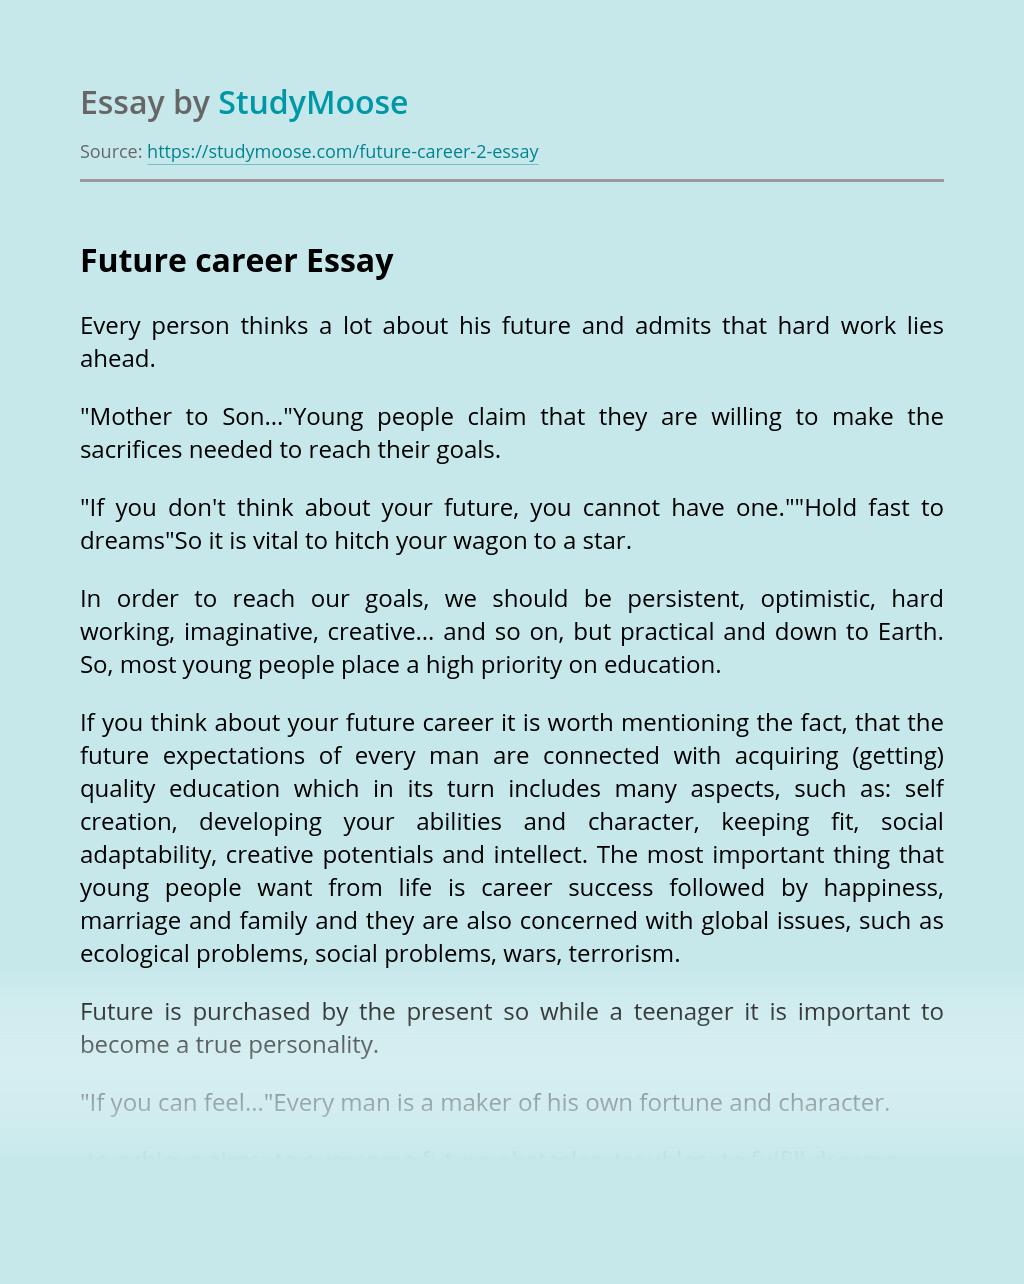 Future career